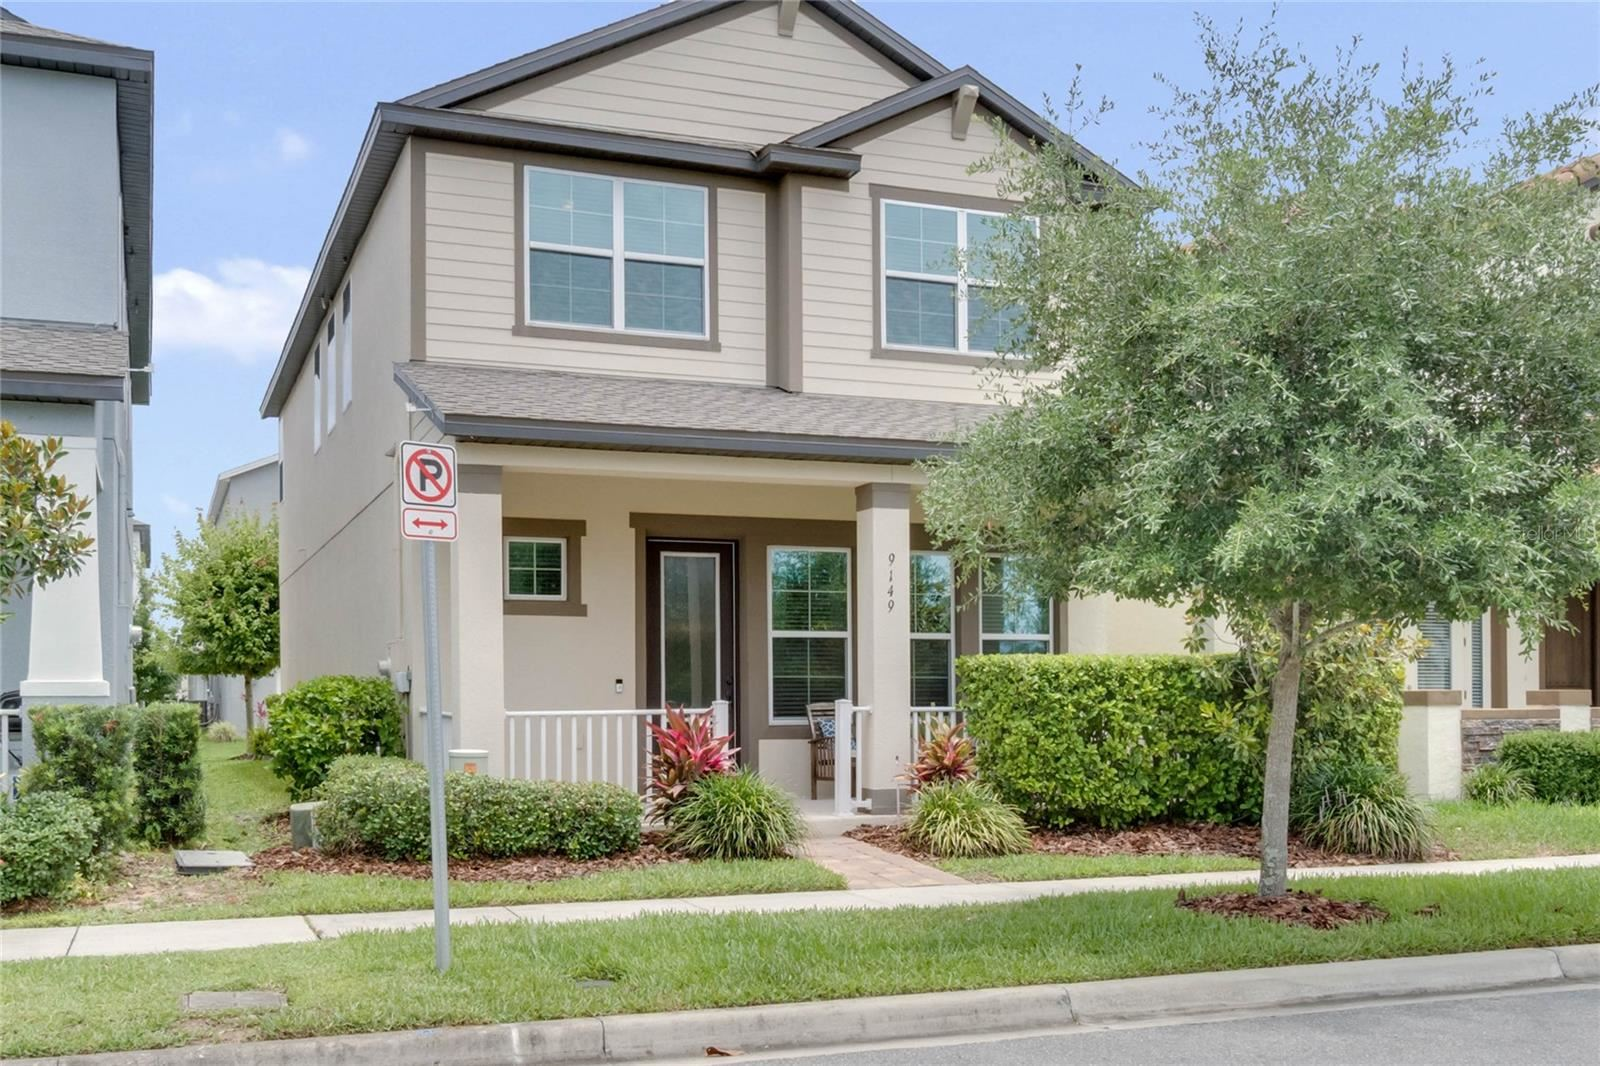 9149 GRAND ISLAND WAY, Winter Garden, FL 34787 - #: O5949857